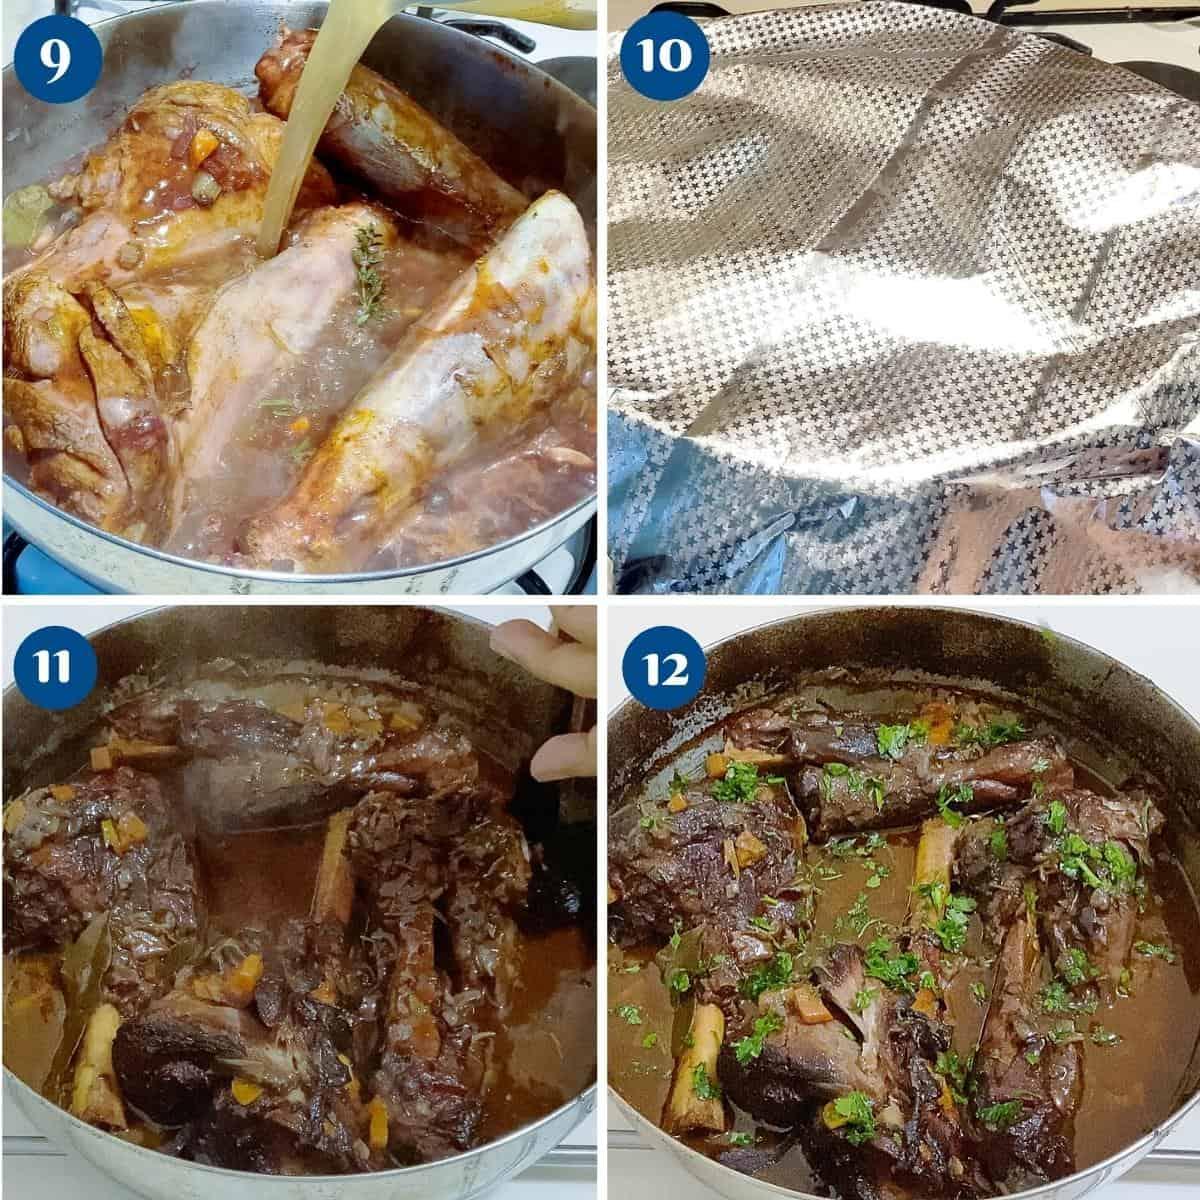 Progress pictures baking the lamb shanks.